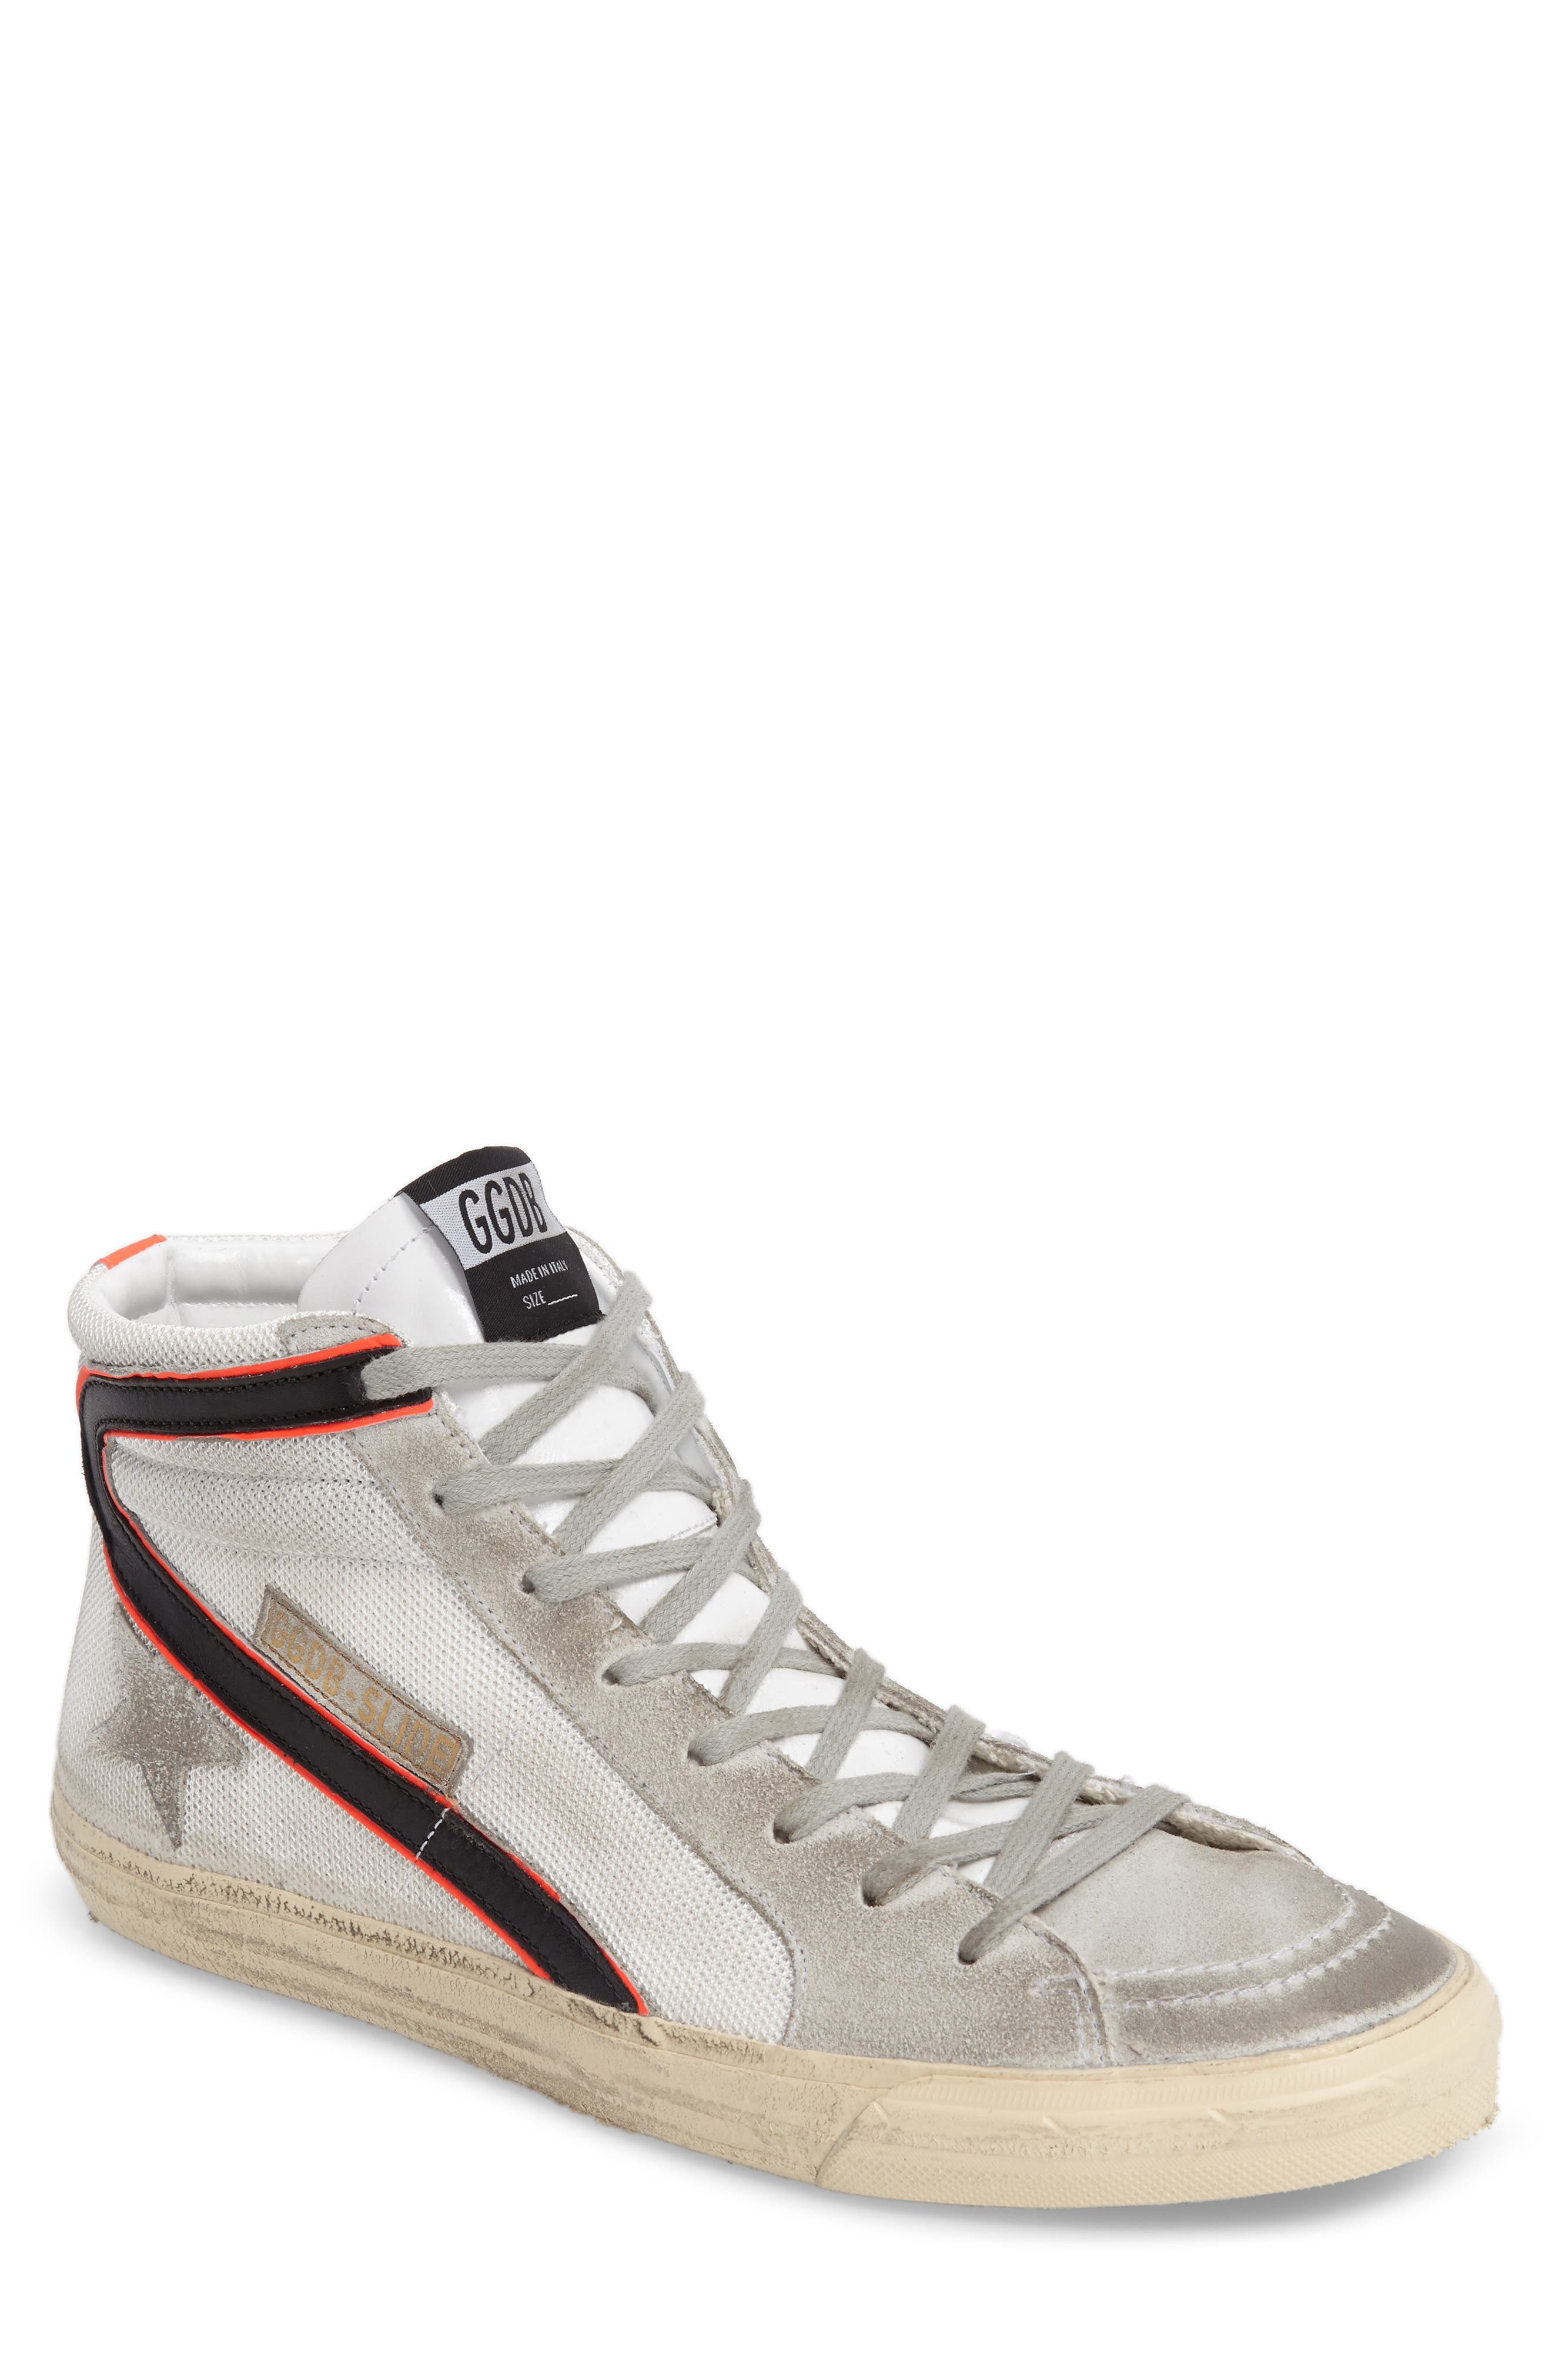 'Slide' Sneaker,                         Main,                         color, White/ Silver Leather